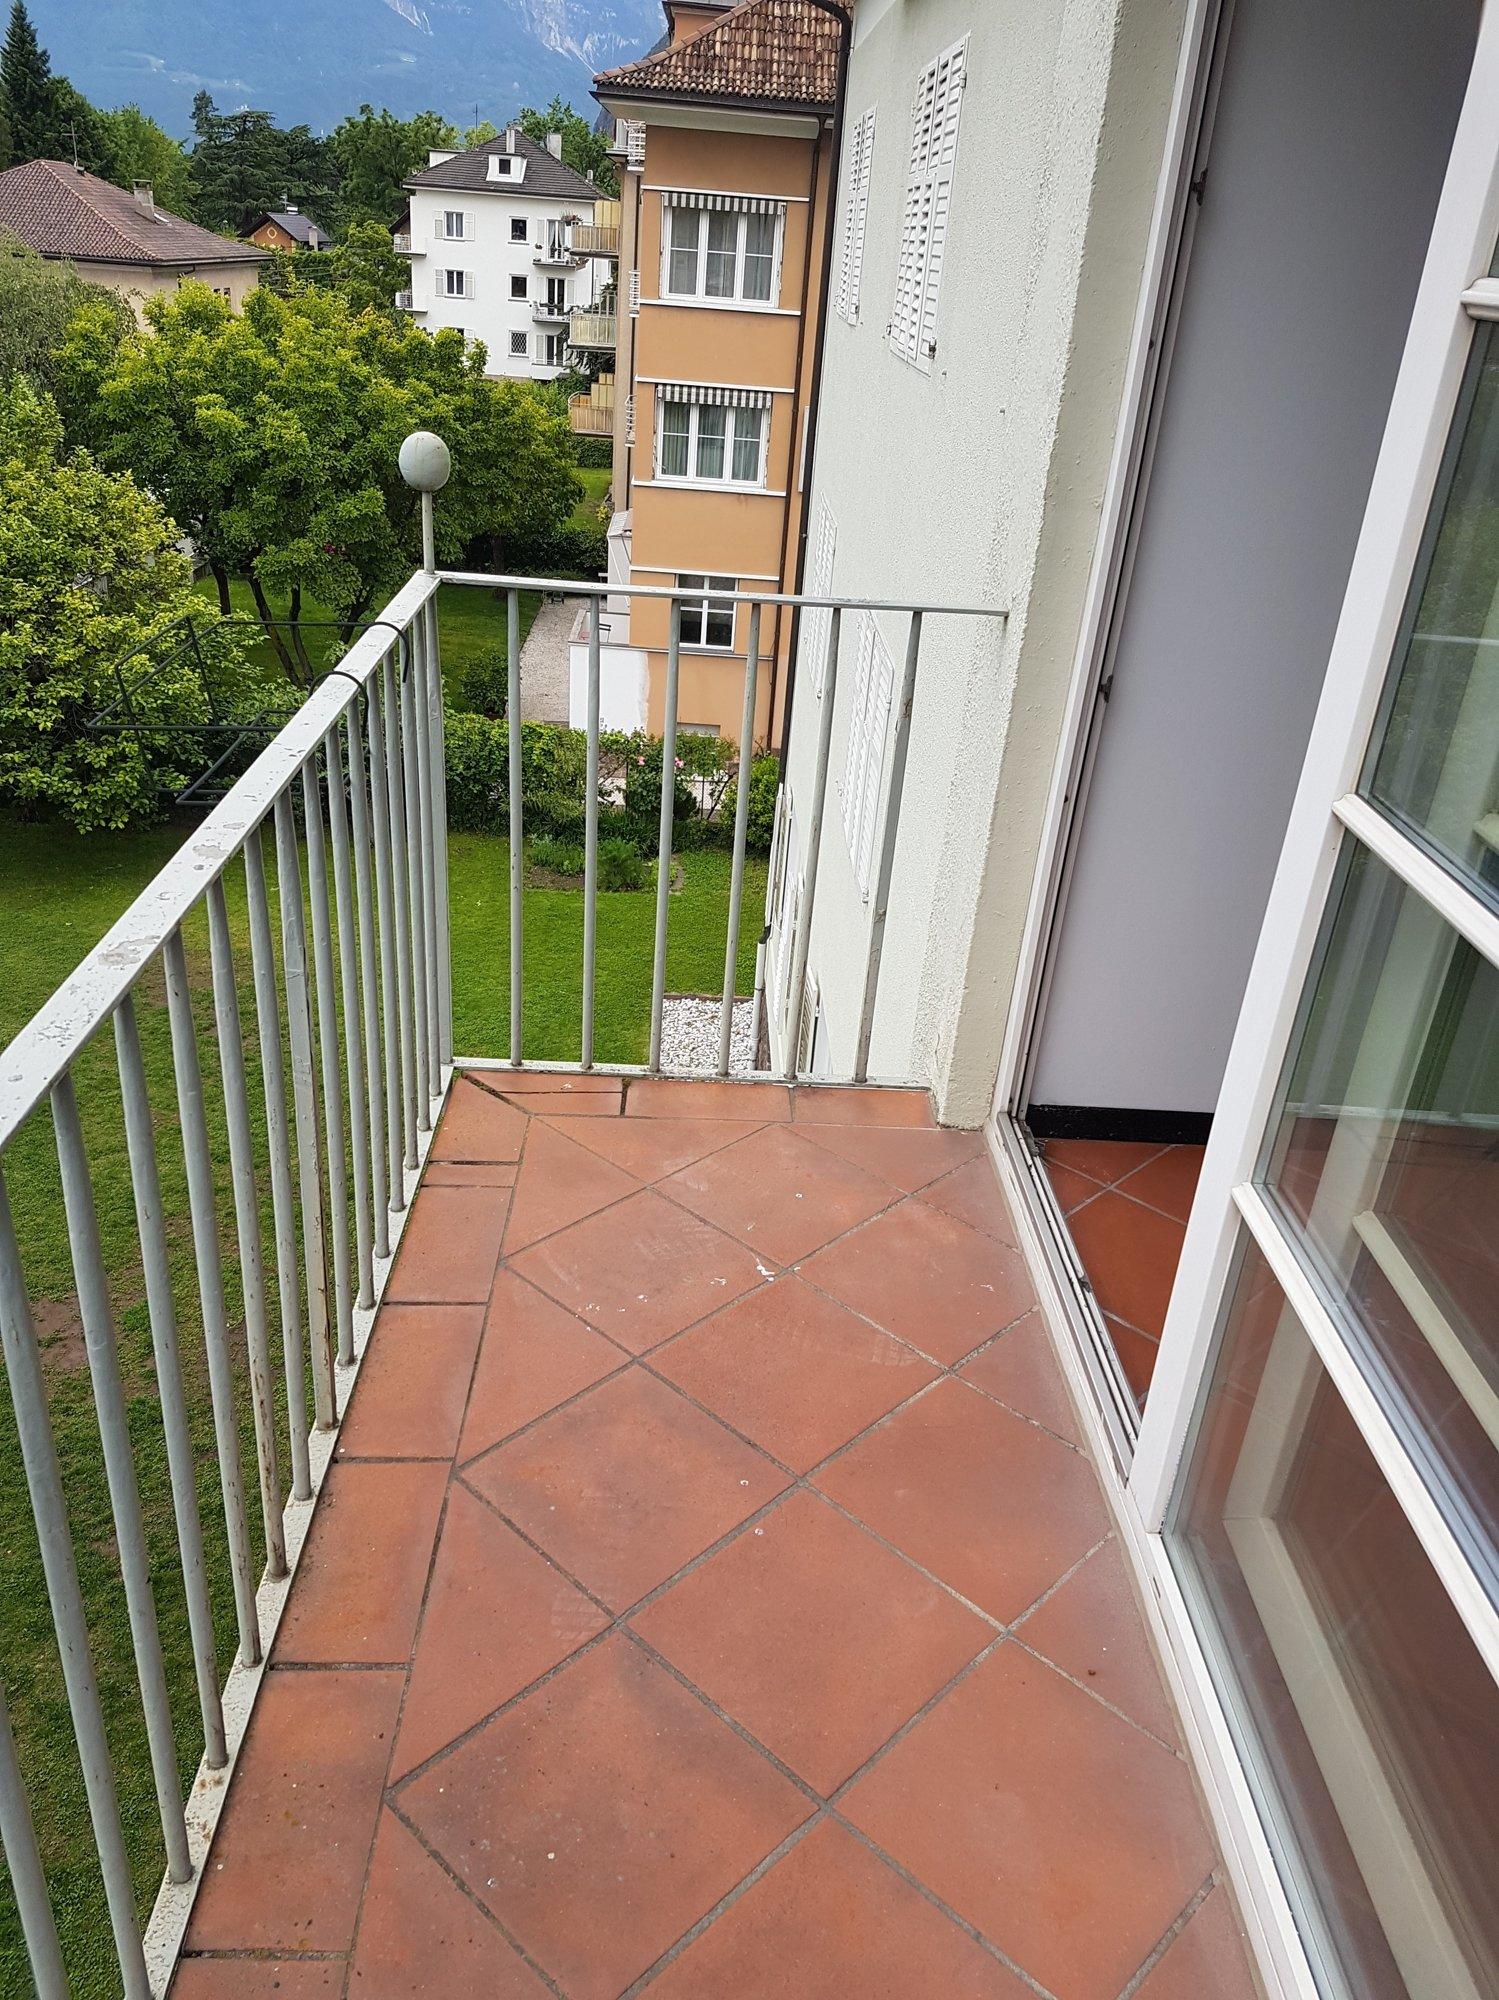 Kleiner Balkon_balcone piccolo